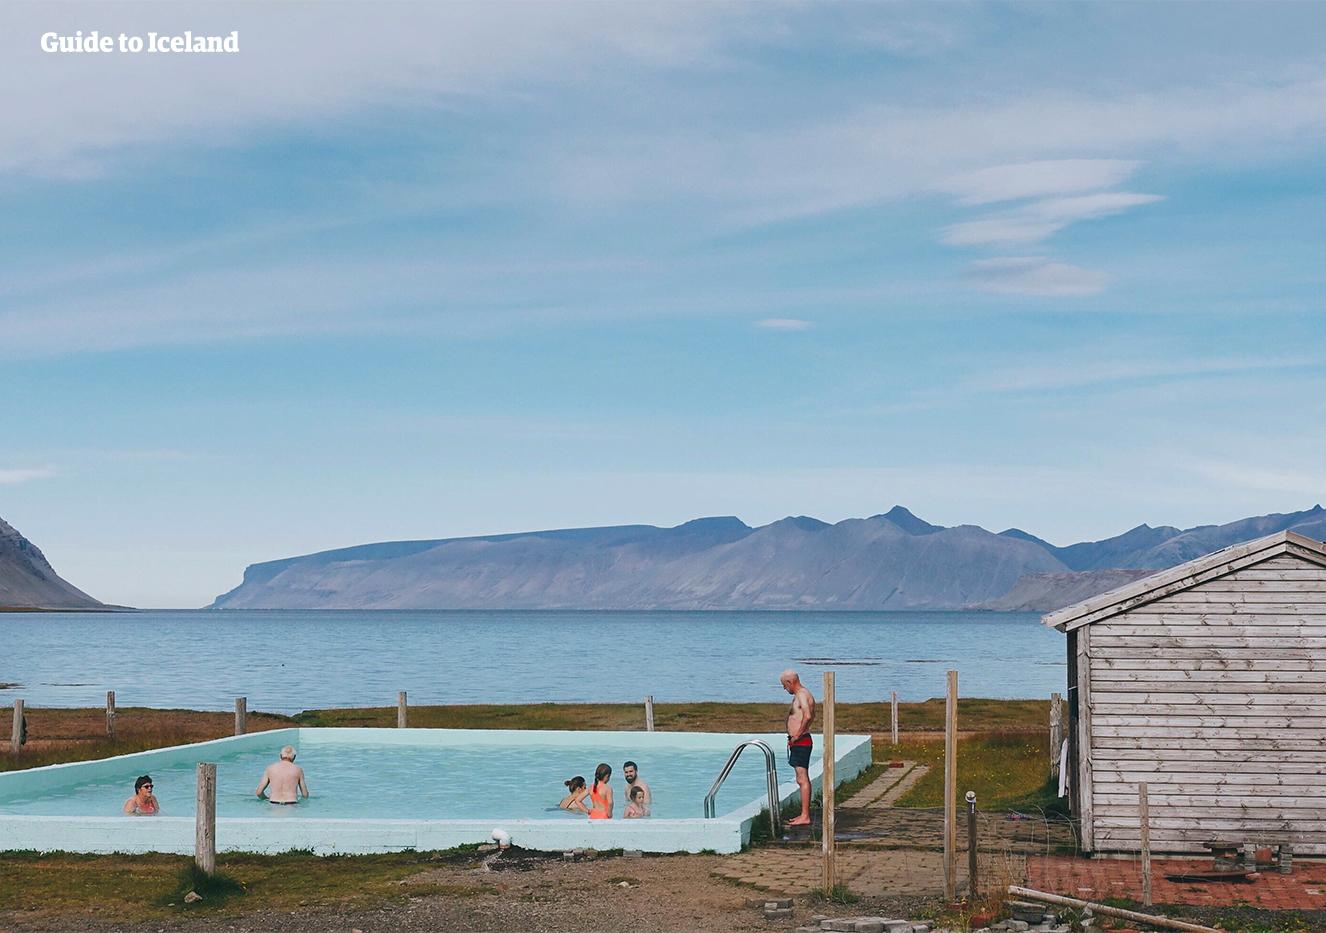 Reykjafarðarlaug geothermal swimming pool can be found in the remote Westfjords of Iceland.